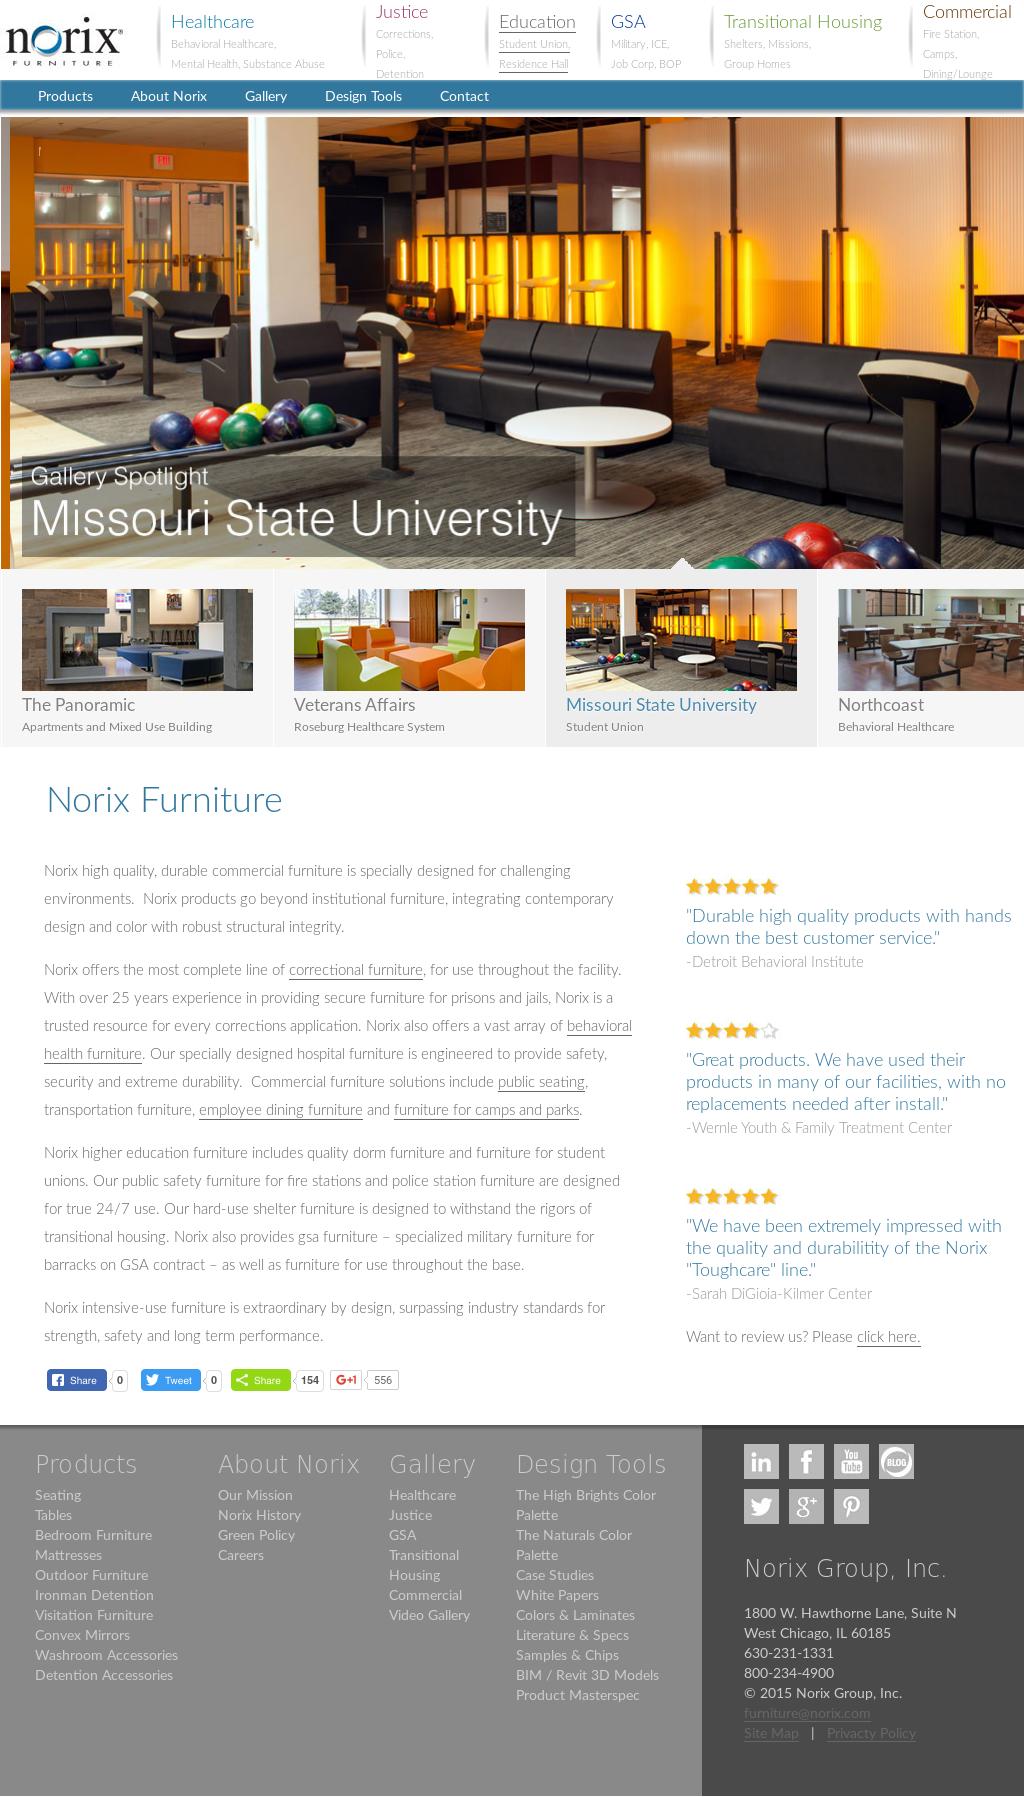 Norix Competitors, Revenue and Employees - Owler Company Profile